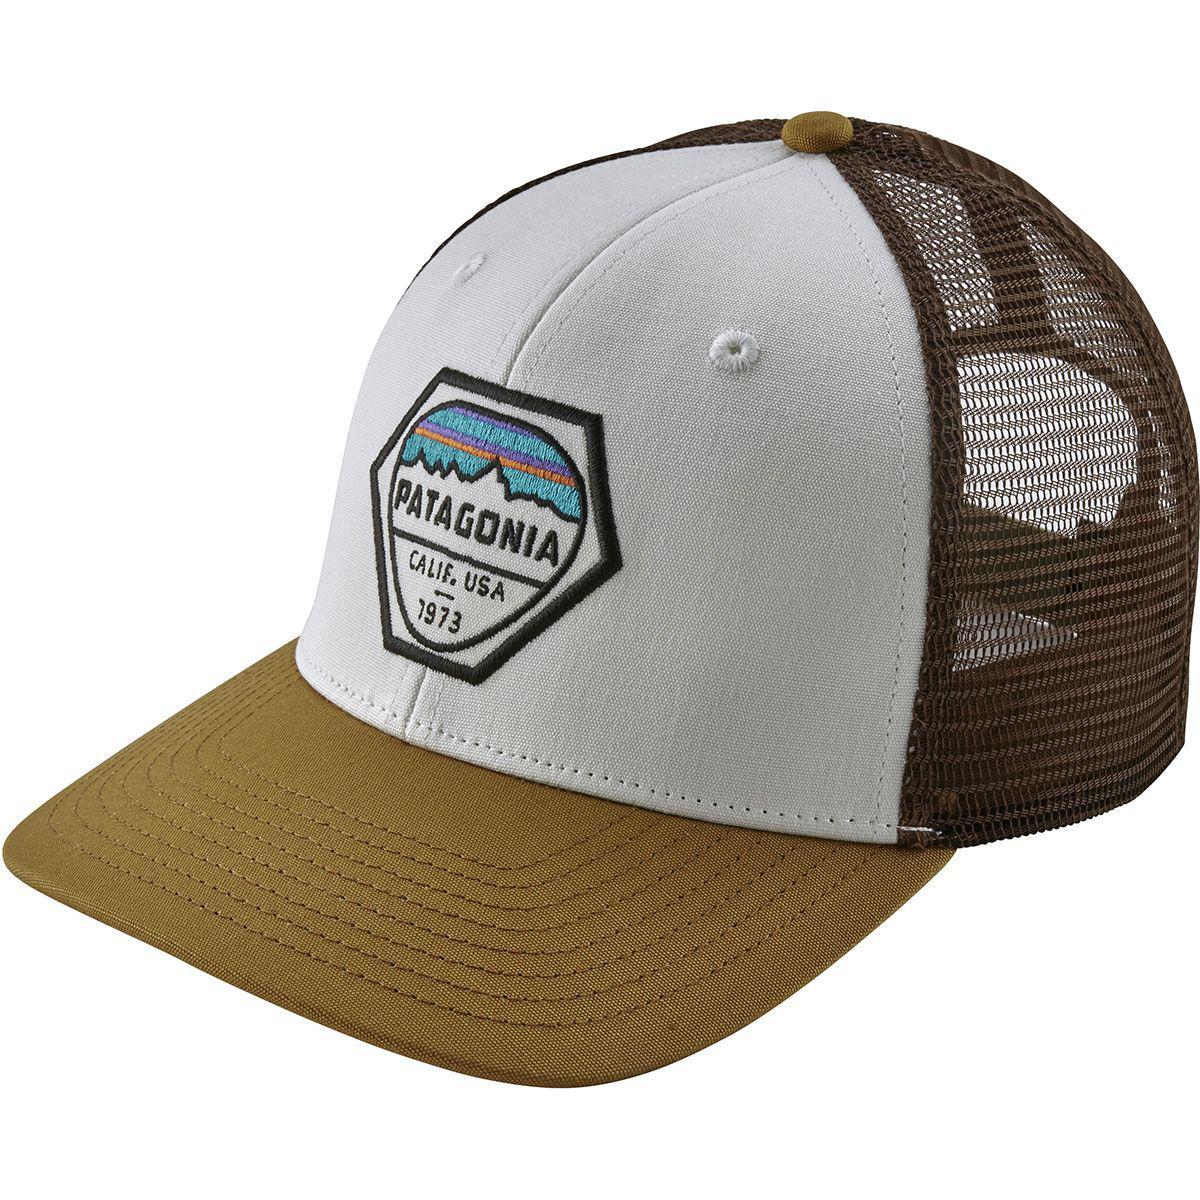 cbe359c462c Lyst - Patagonia Fitz Roy Hex Trucker Hat in White for Men